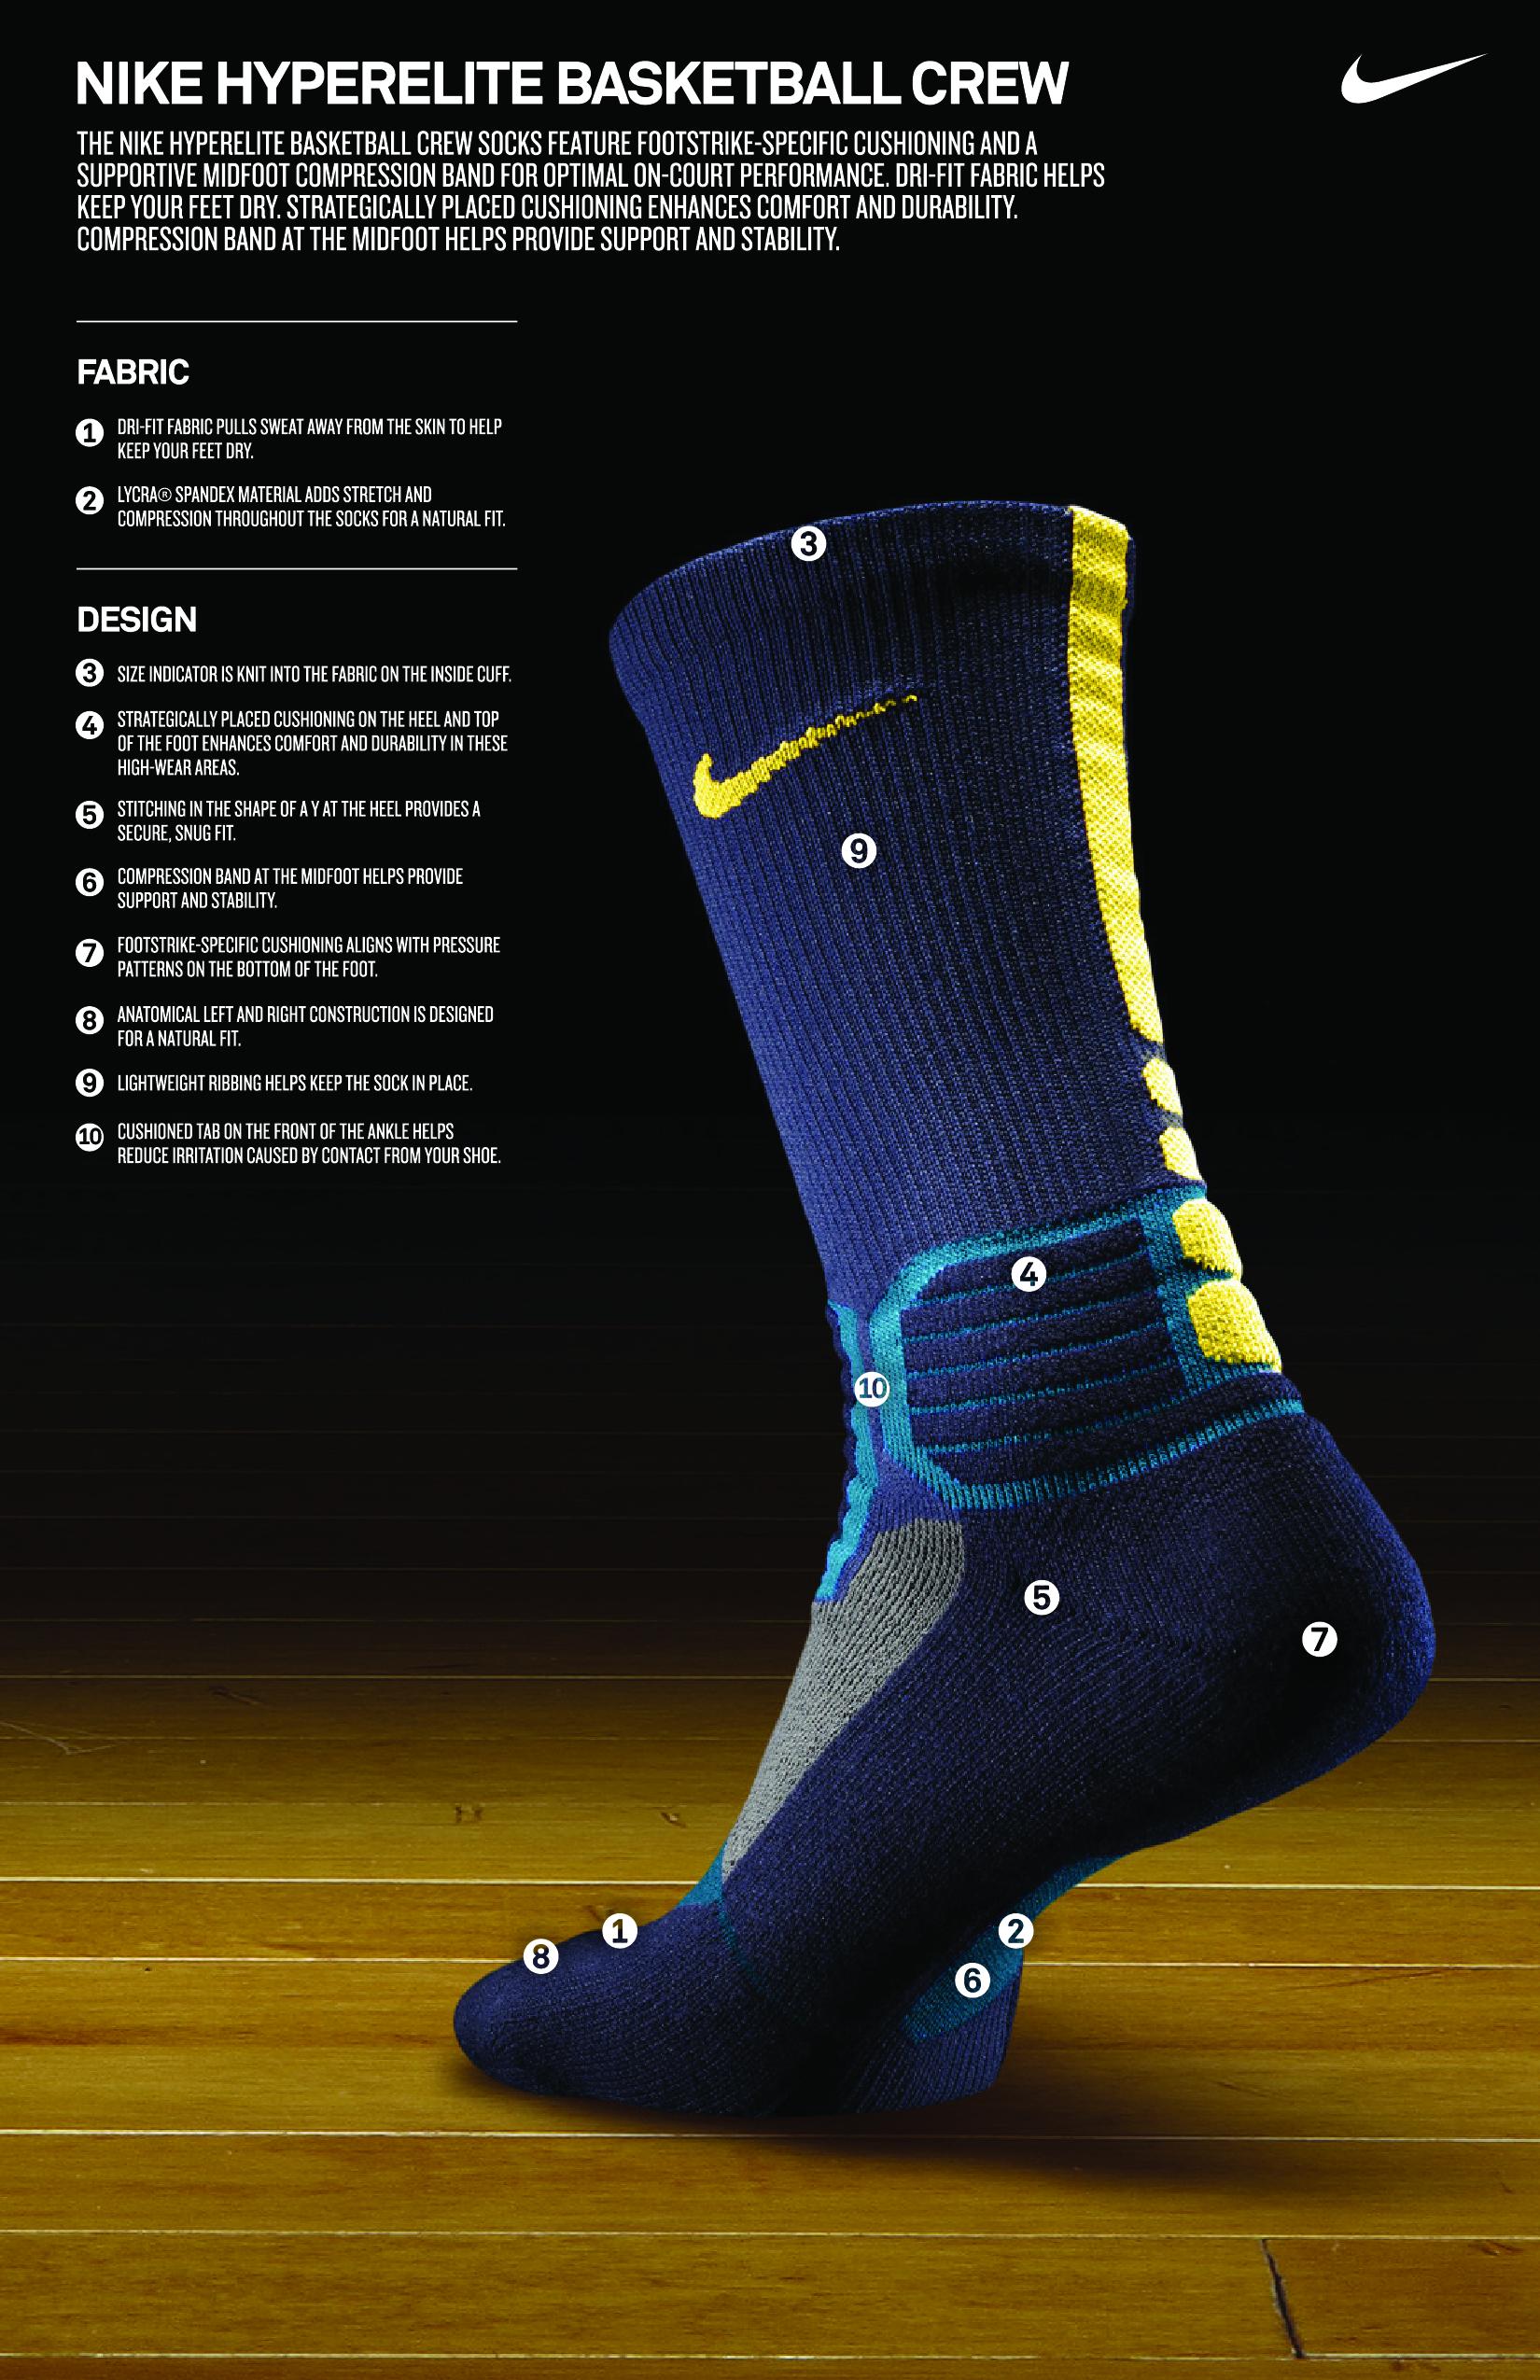 Introducing The Nike Hyper Elite Basketball Crew Socks ...